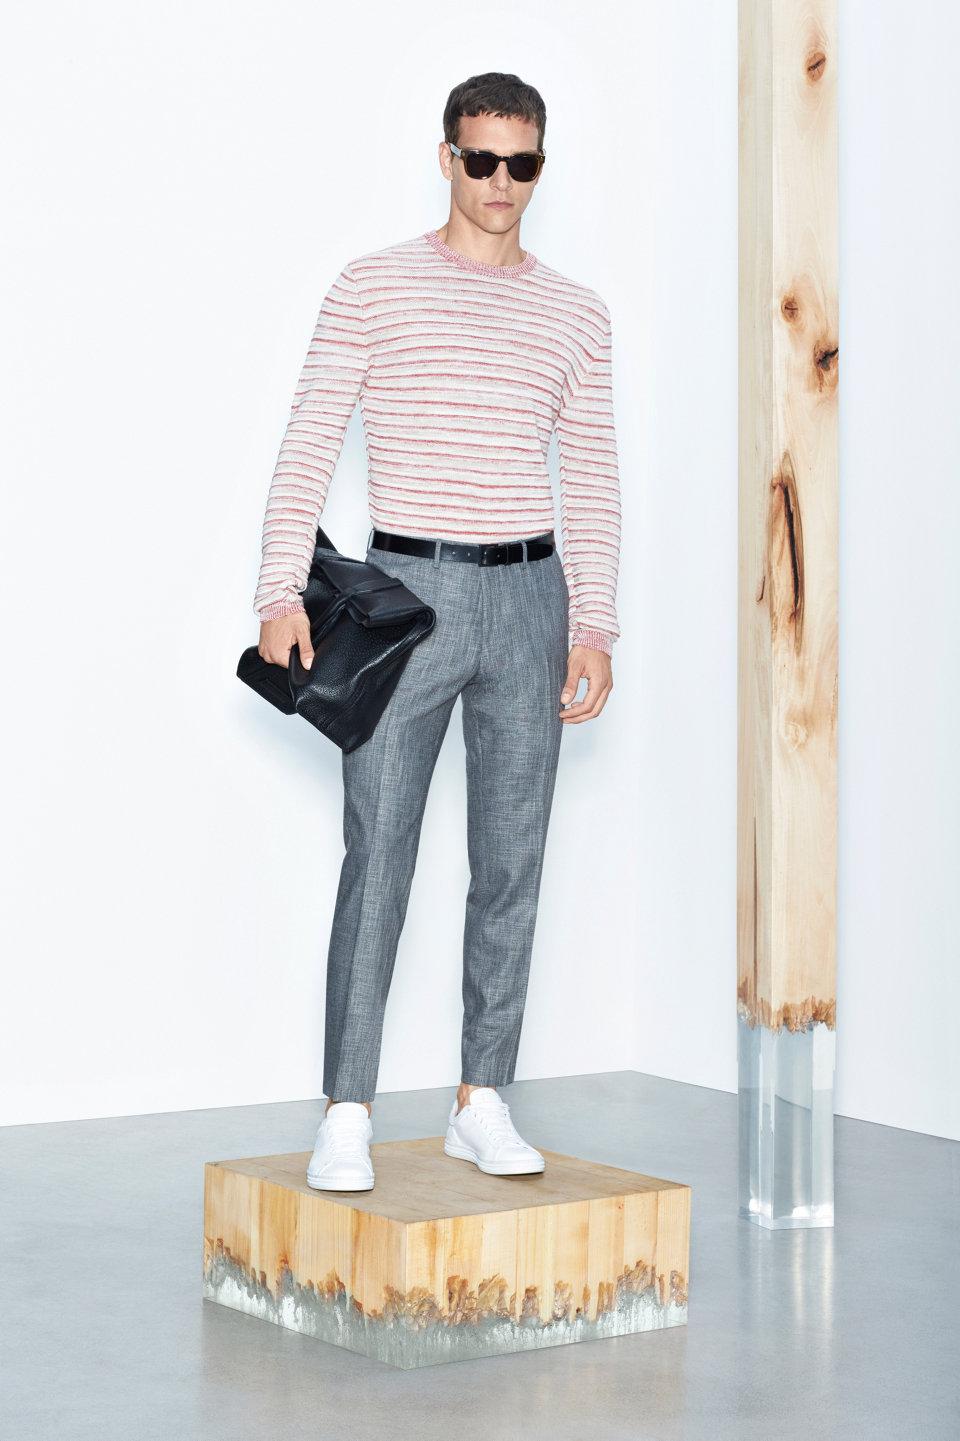 Pull à rayures, pantalon gris et baskets blanchesBOSS